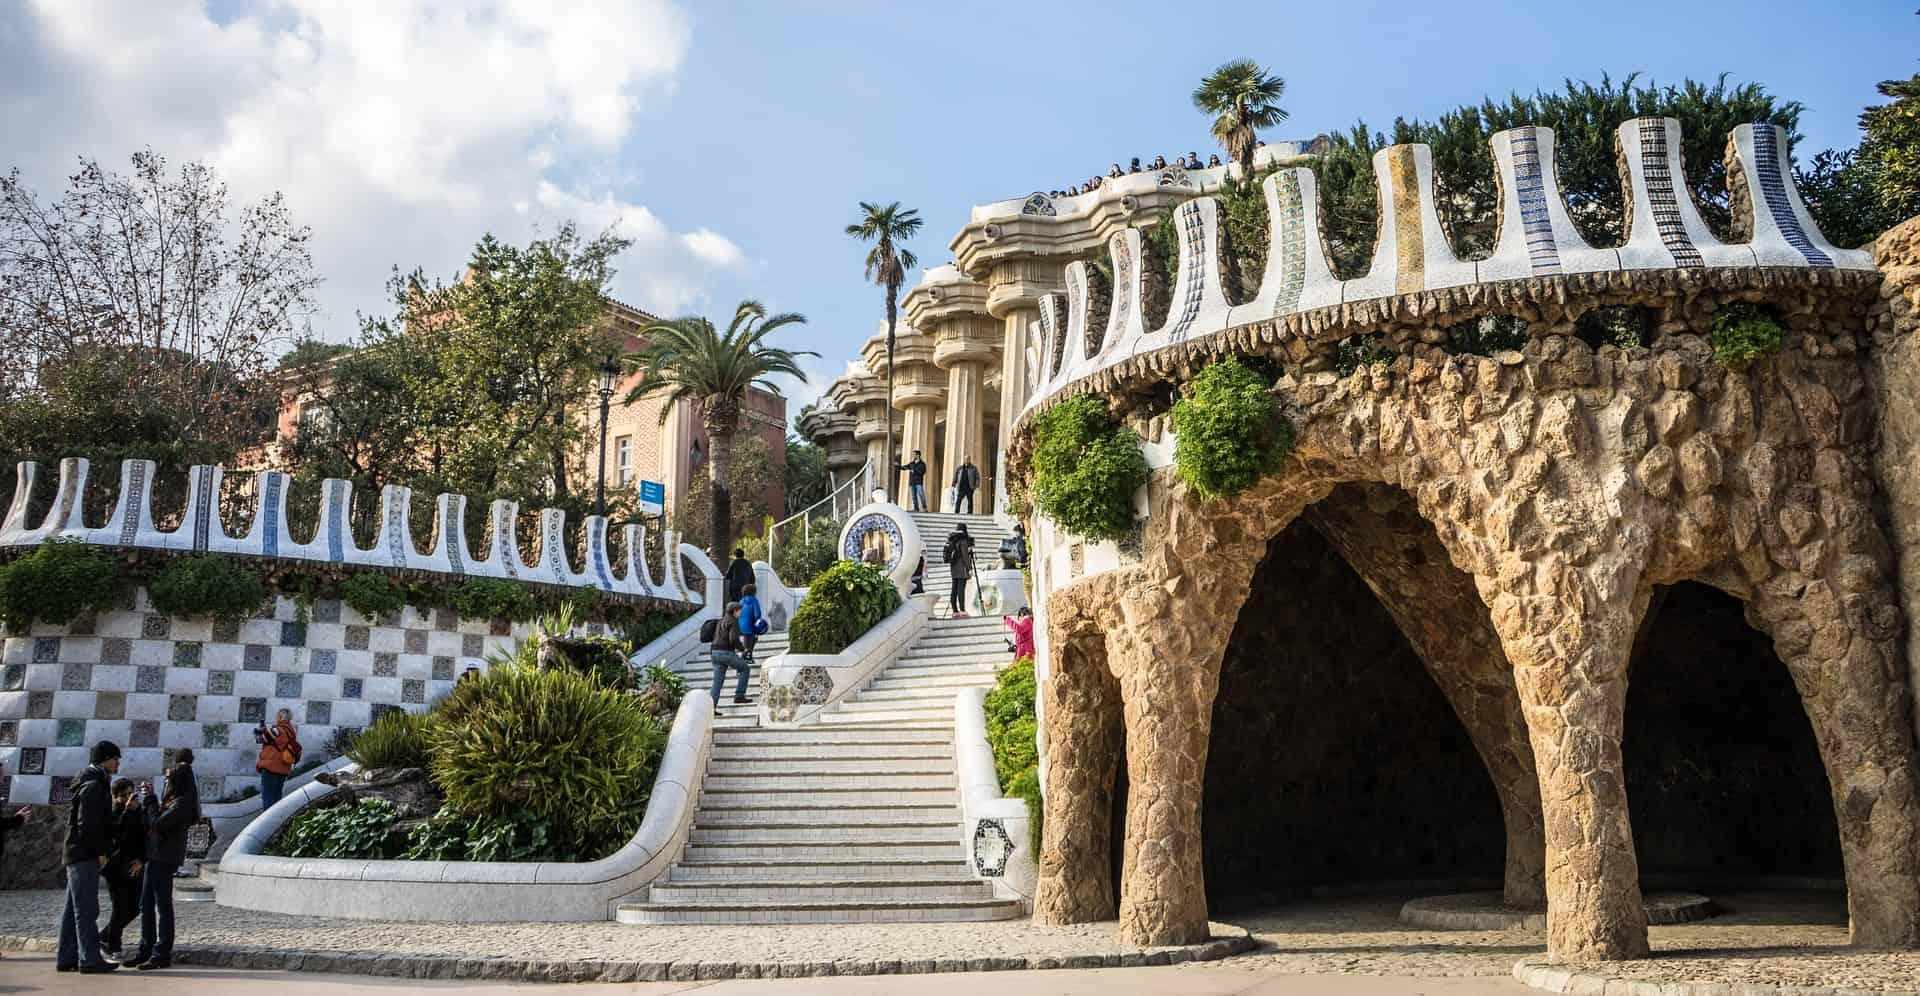 Guell Ppark - Barcelona Travel Destination